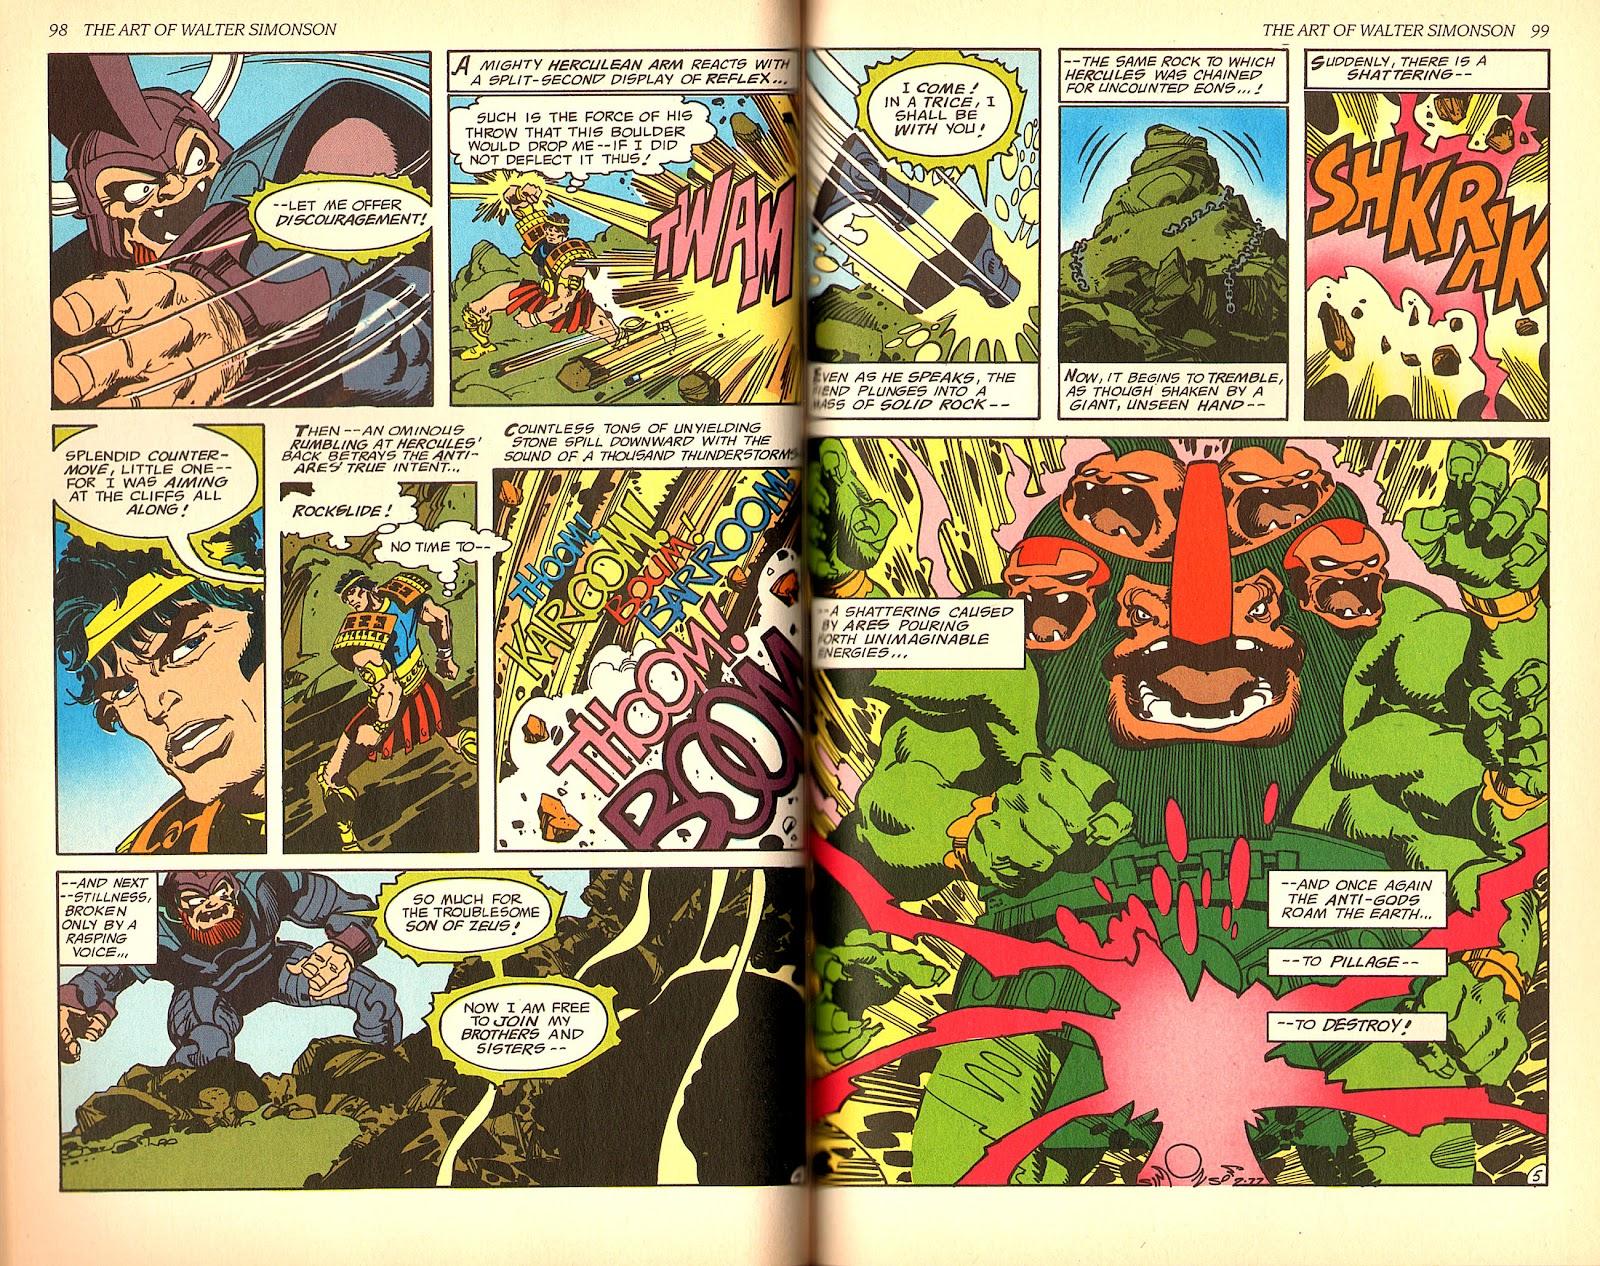 Read online The Art of Walter Simonson comic -  Issue # TPB - 51